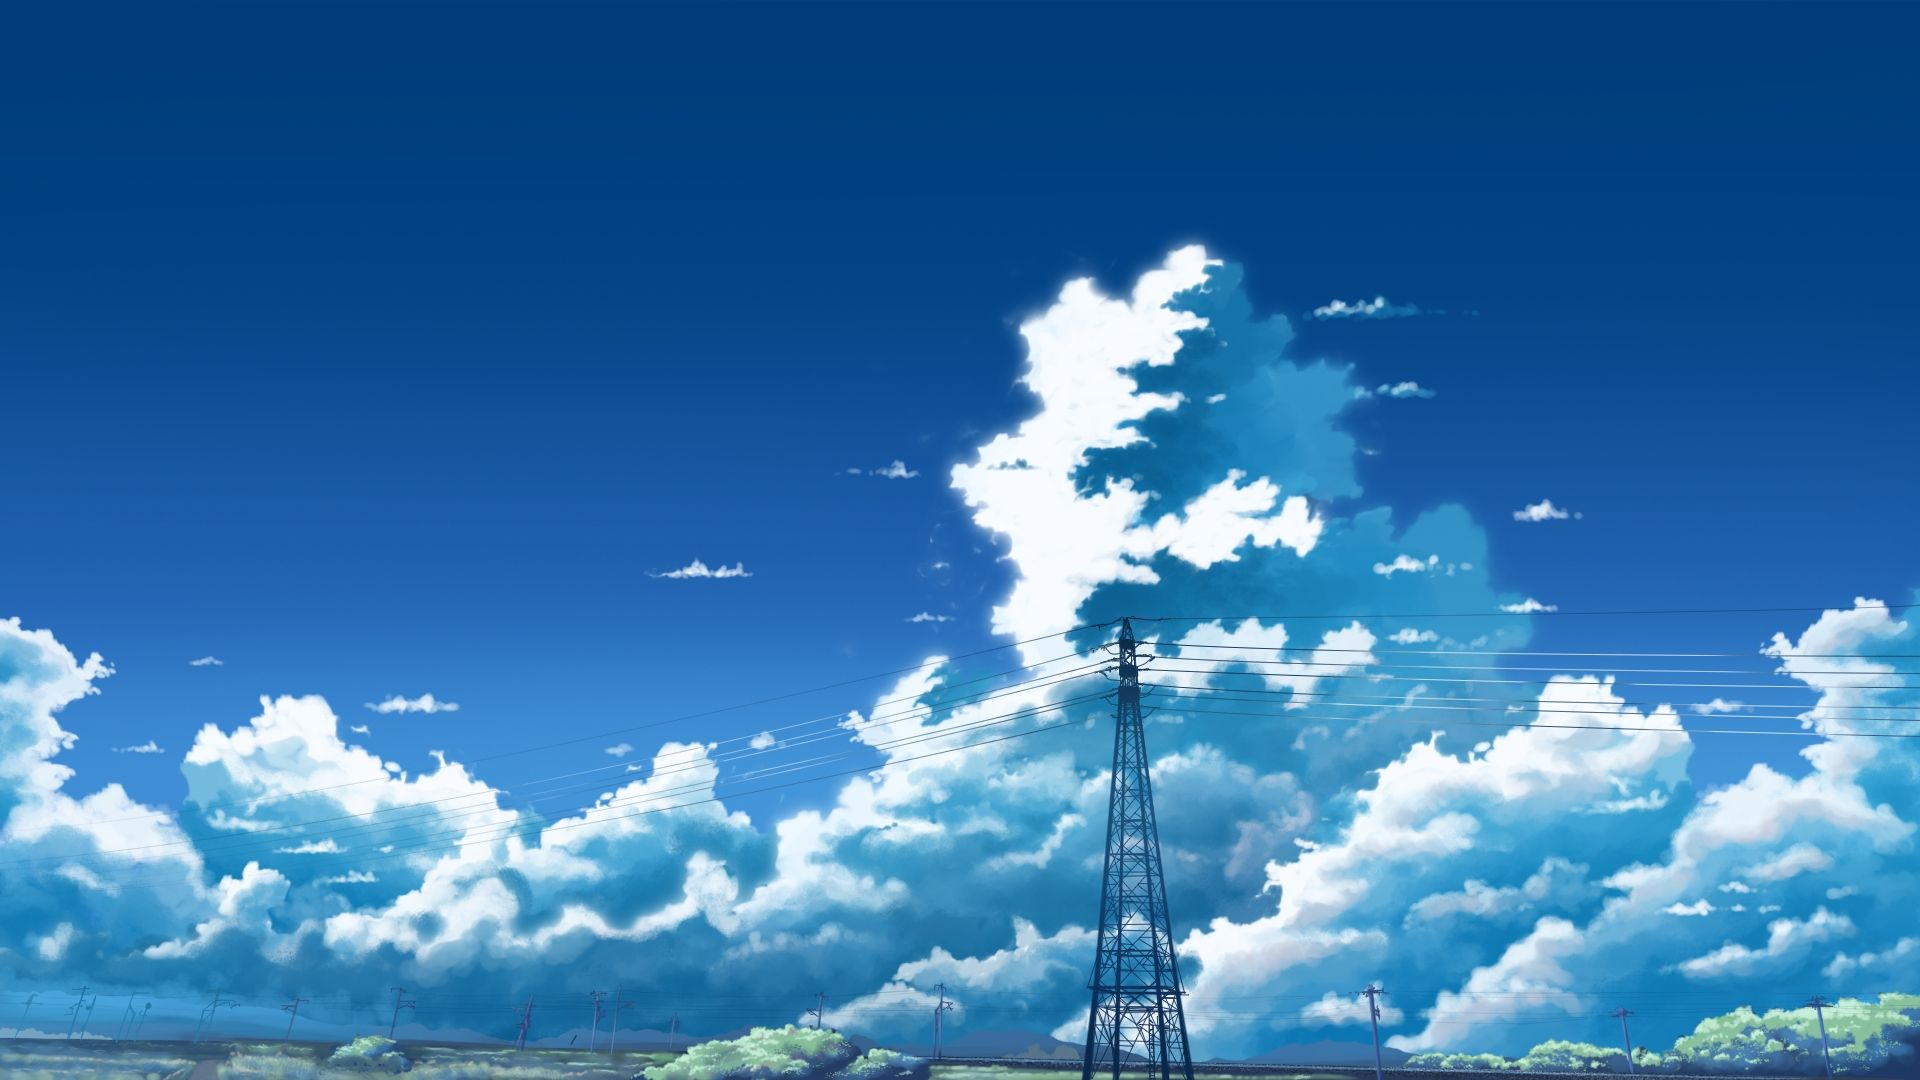 animeskyanimelandscapecloudsanime Phong cảnh, Anime